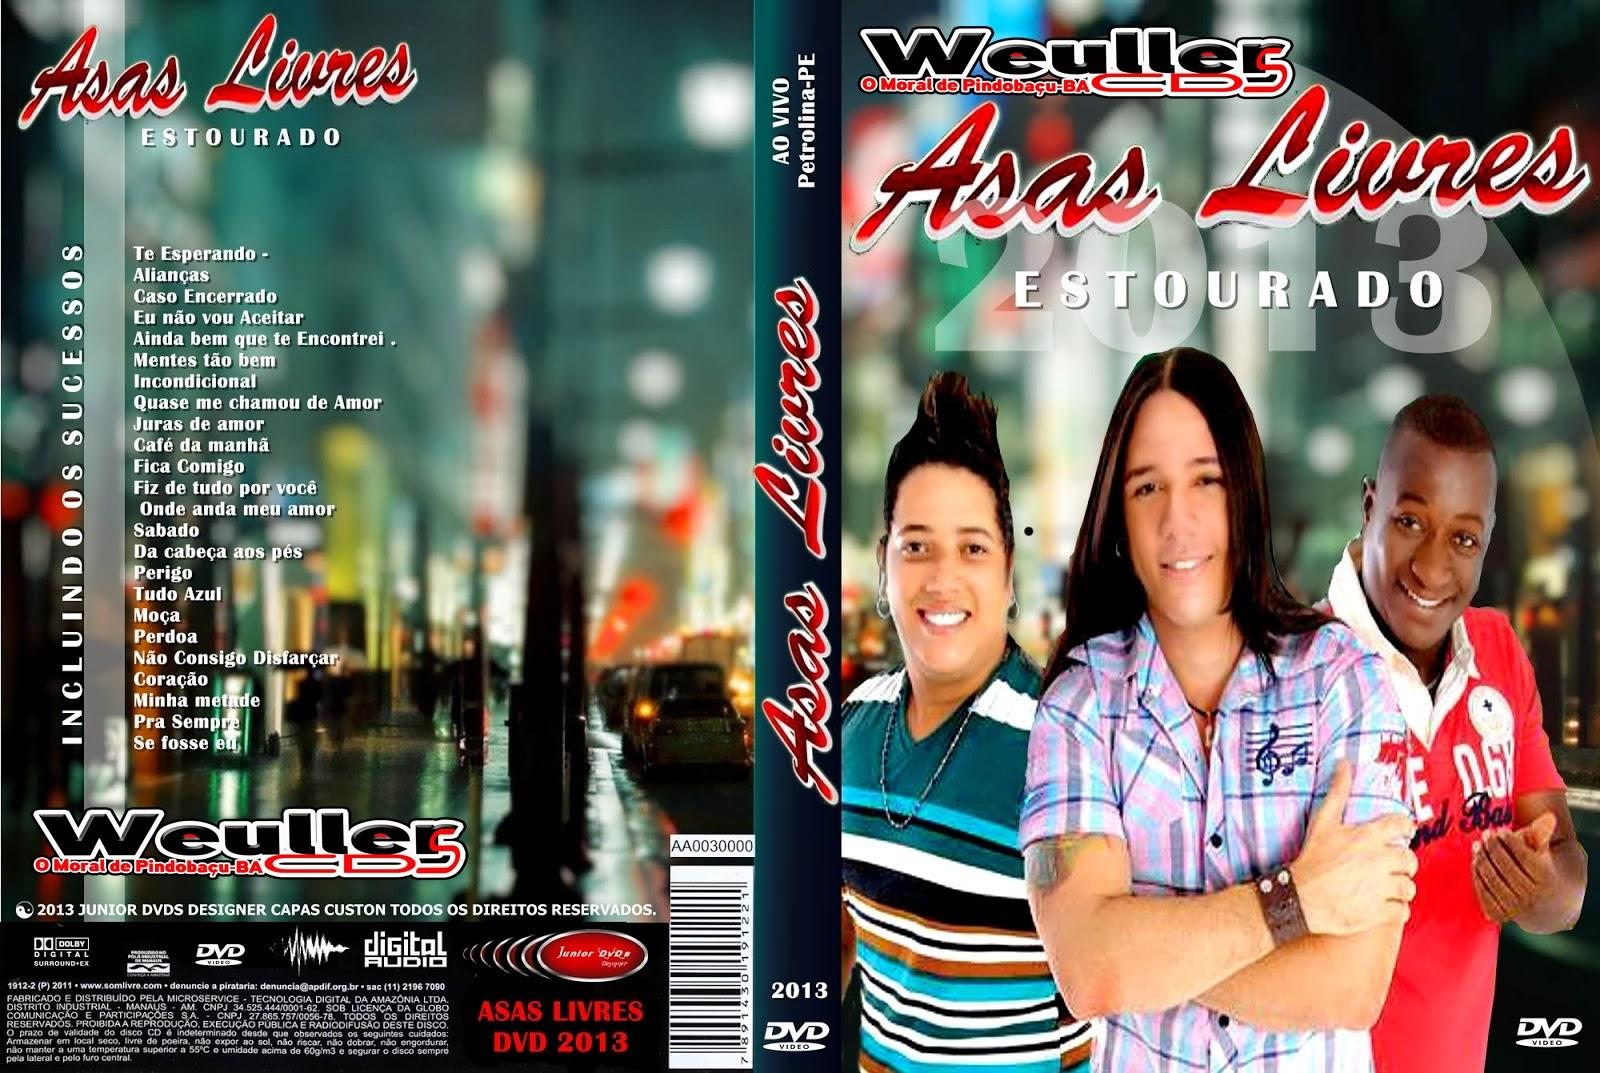 TARRAXINHA BAIXAR DVD DE